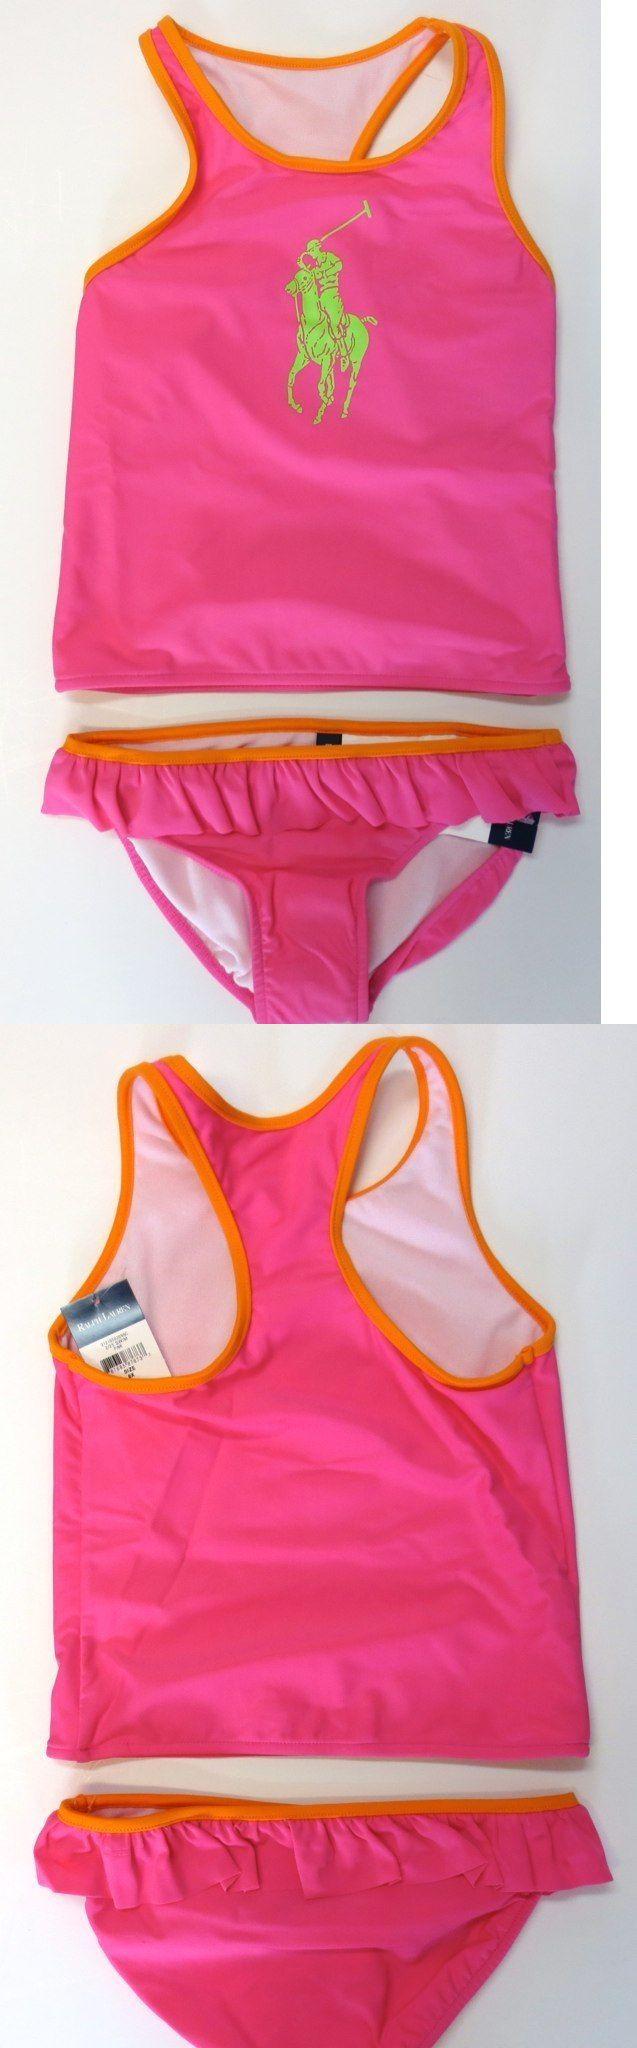 Swimwear 152398: Ralph Lauren Polo Girls Swimsuit Sz 3 3T Tankini Kids Toddler Pink Two Piece -> BUY IT NOW ONLY: $35 on eBay!